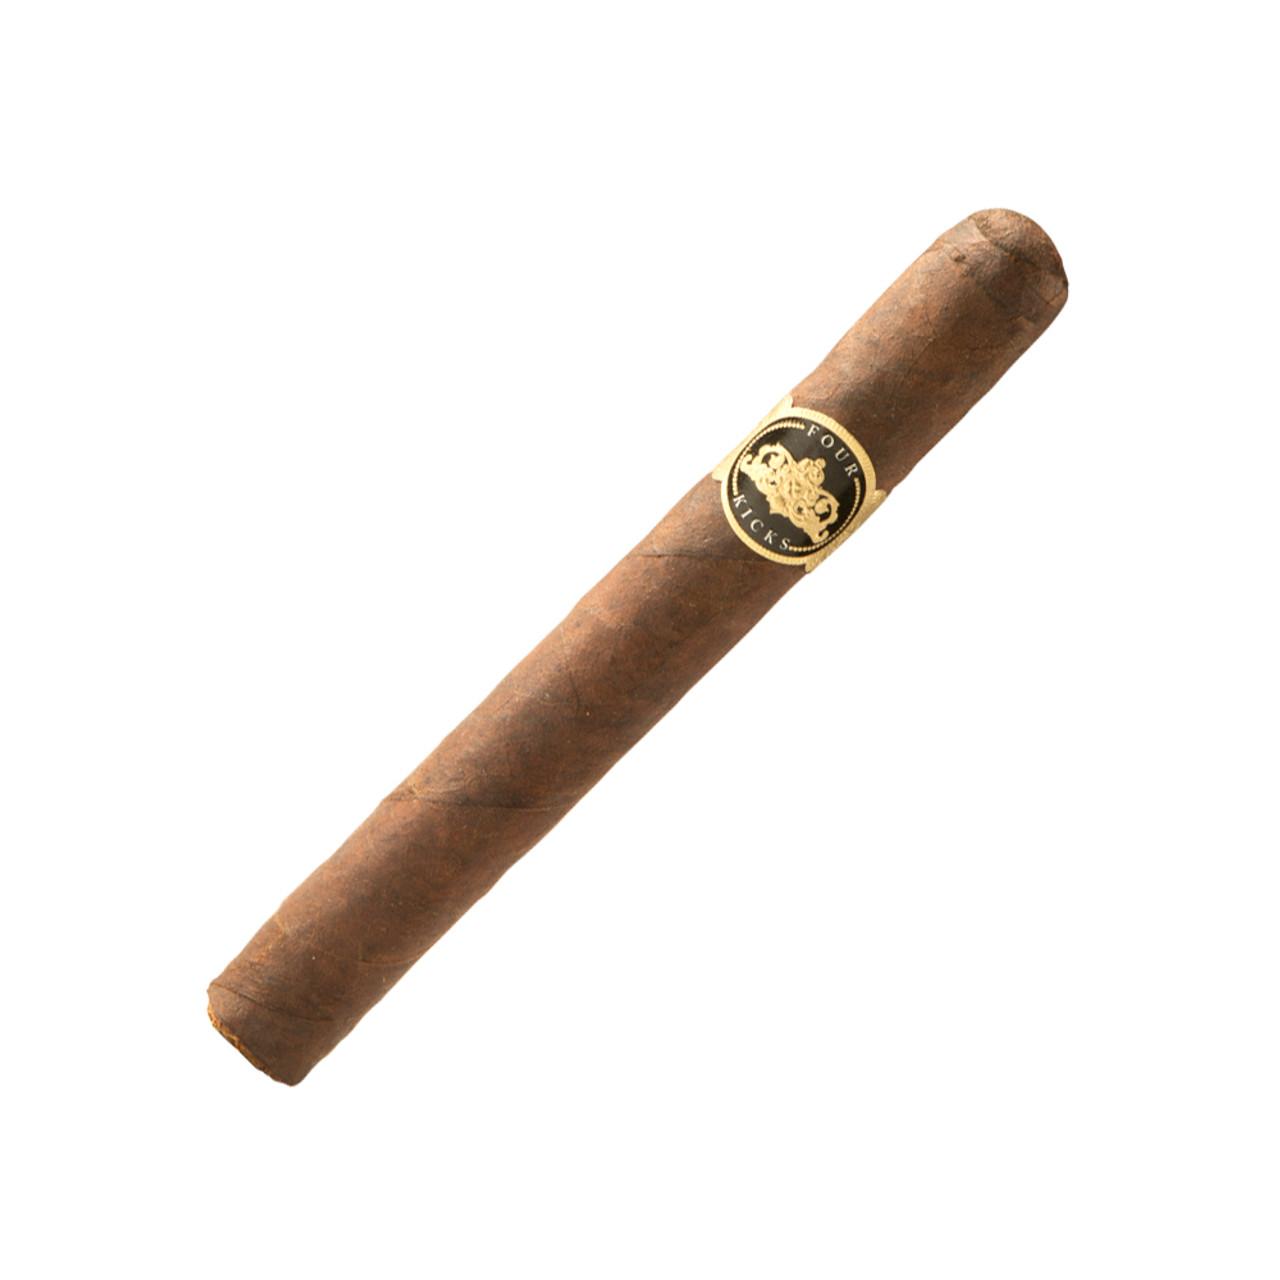 Four Kicks Maduro Corona Gorda Cigars - 5.58 x 46 (Box of 24)